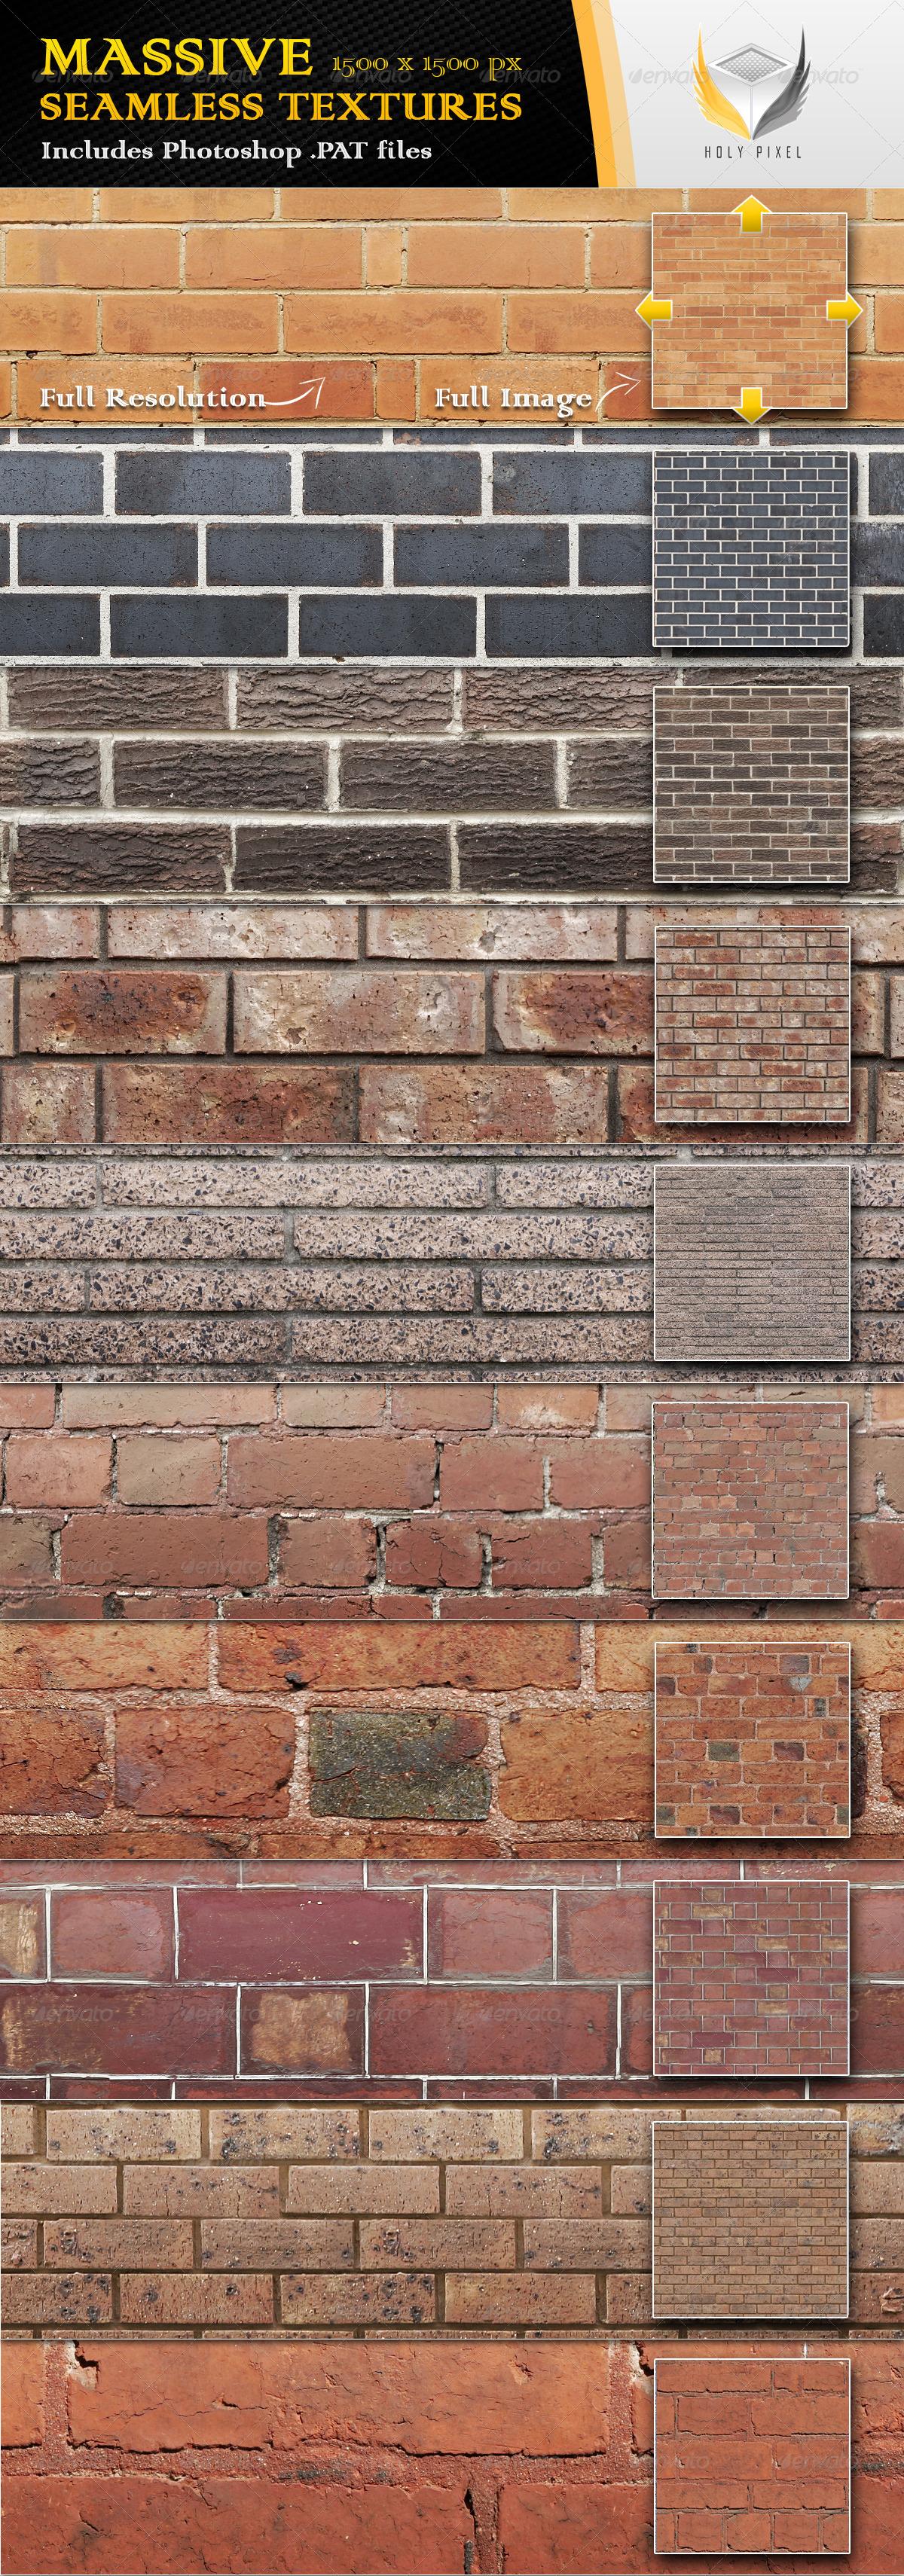 10 Seamless Clean Brick Textures - Urban Textures / Fills / Patterns